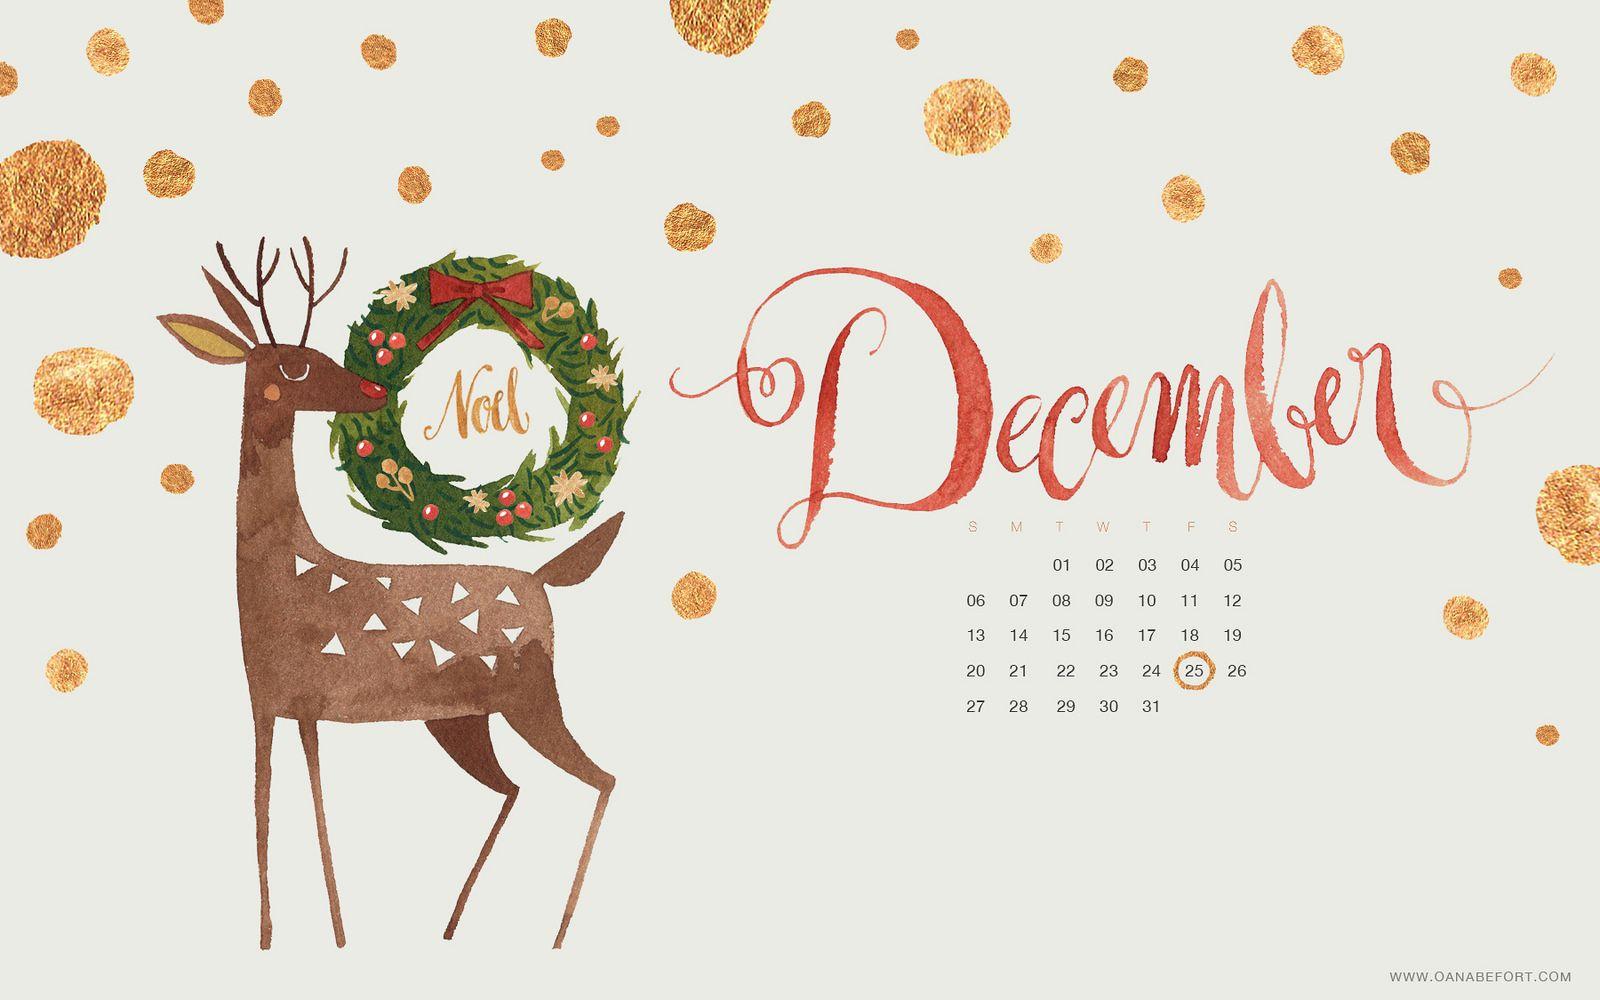 December 2015 Desktop Wallpaper Iphone Christmas Christmas Desktop Wallpaper Computer Wallpaper Desktop Wallpapers